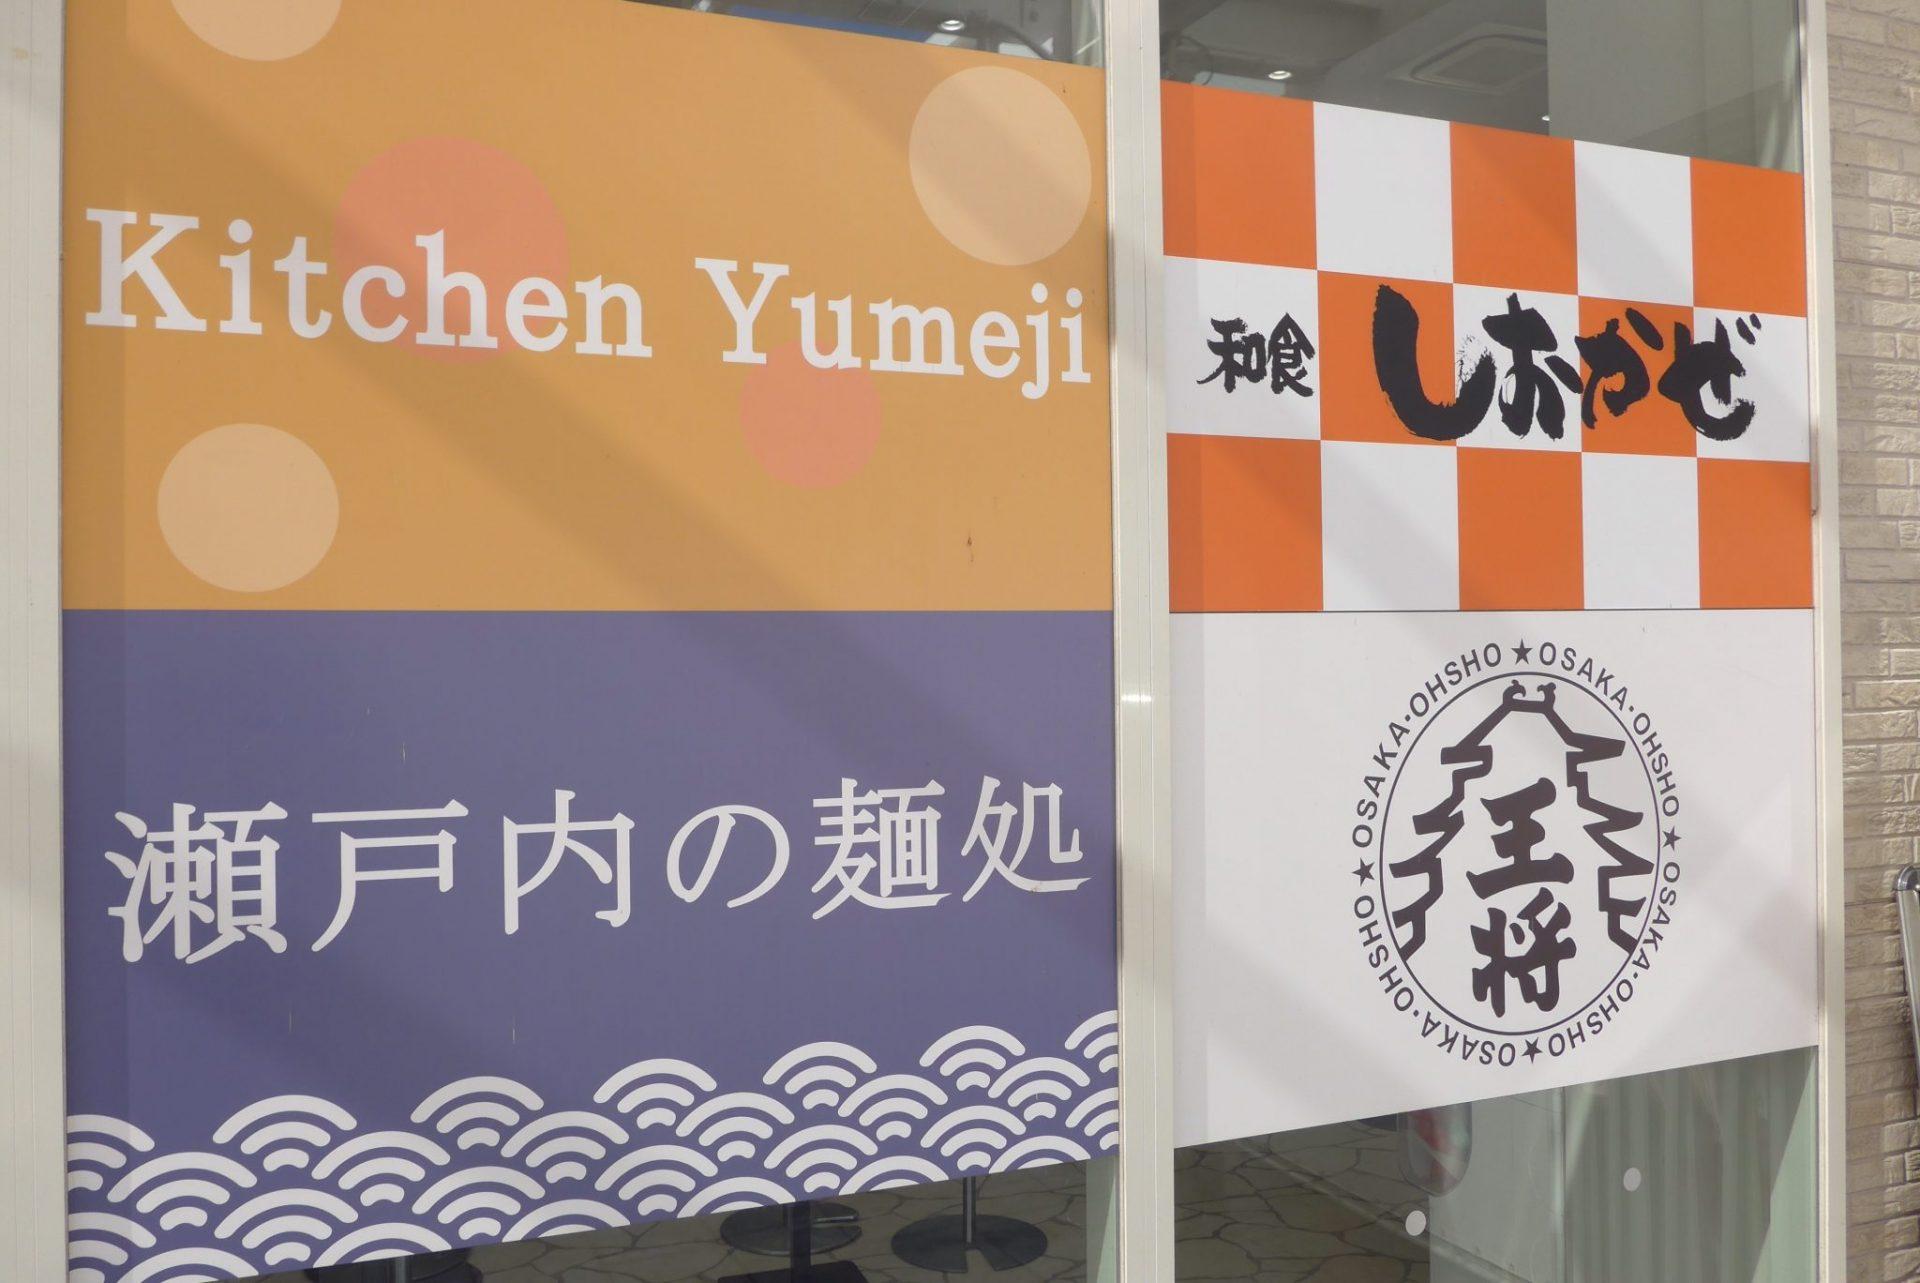 (G)福山サービスエリア上り『瀬戸内の麺処』尾道ラーメンは絶品!